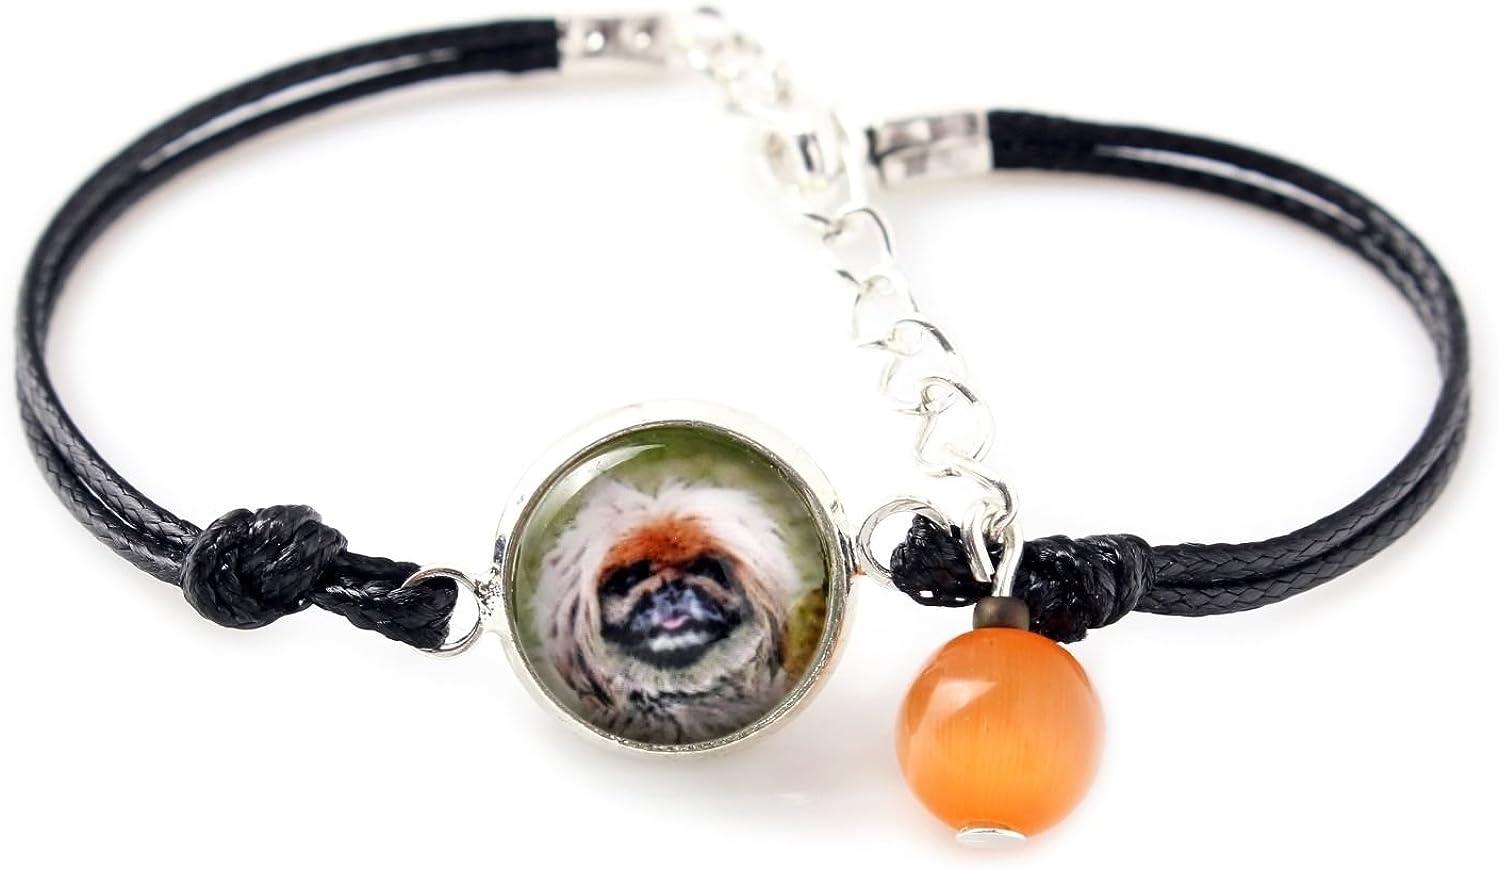 Pekingese Handmade Photo Jewelry Set of Earrings a Bracelet and Necklace with Box Art Dog Ltd